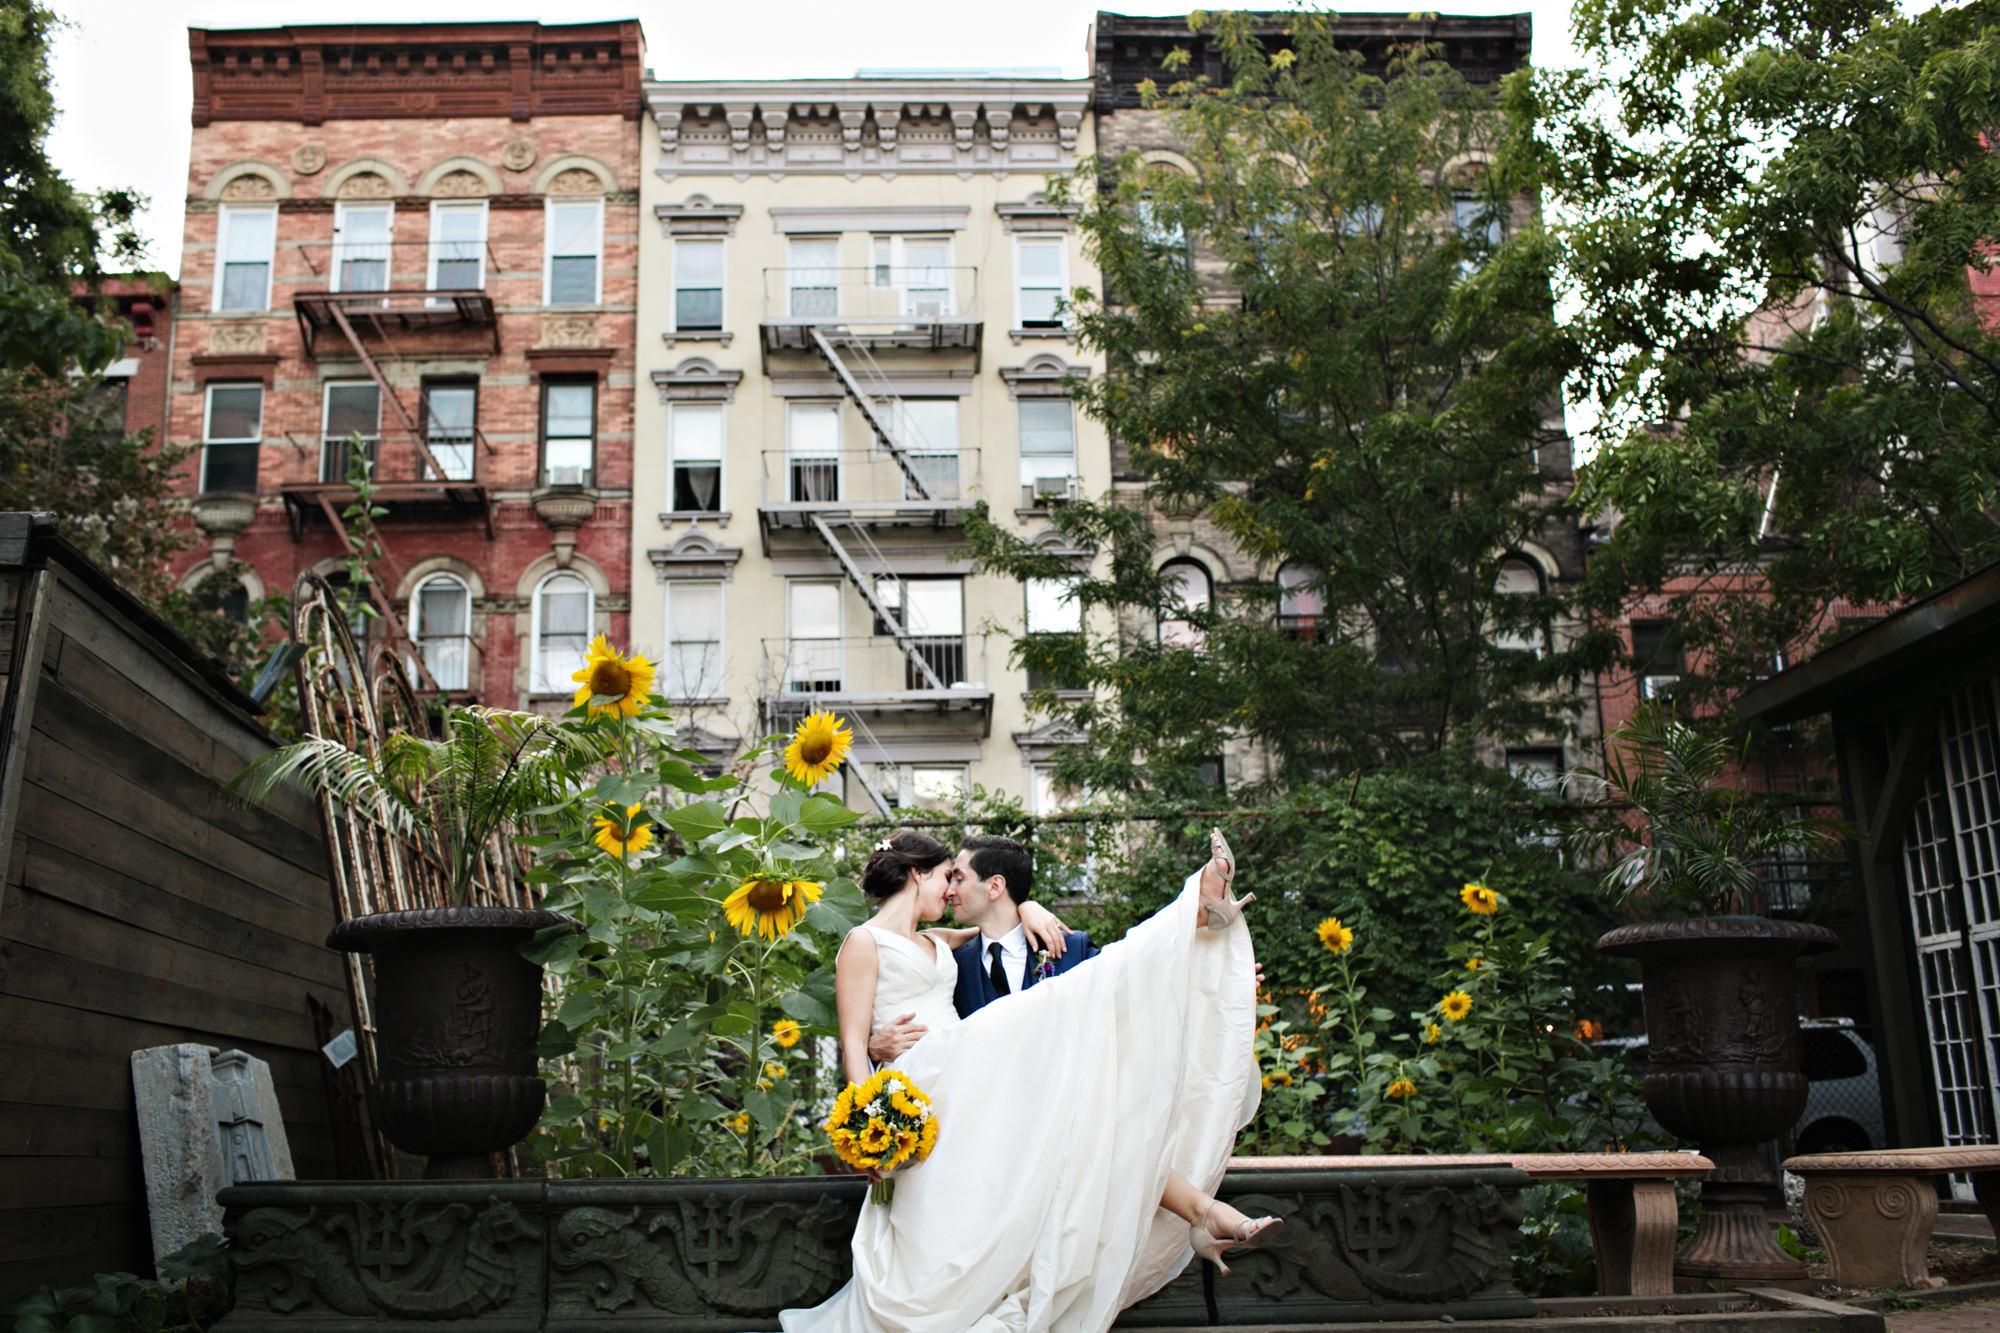 groom-lifts-bride-off-feet-in-sunflower-garden-bouquet-worlds-best-wedding-photos-jenny-jimenez-seattle-wedding-photographers